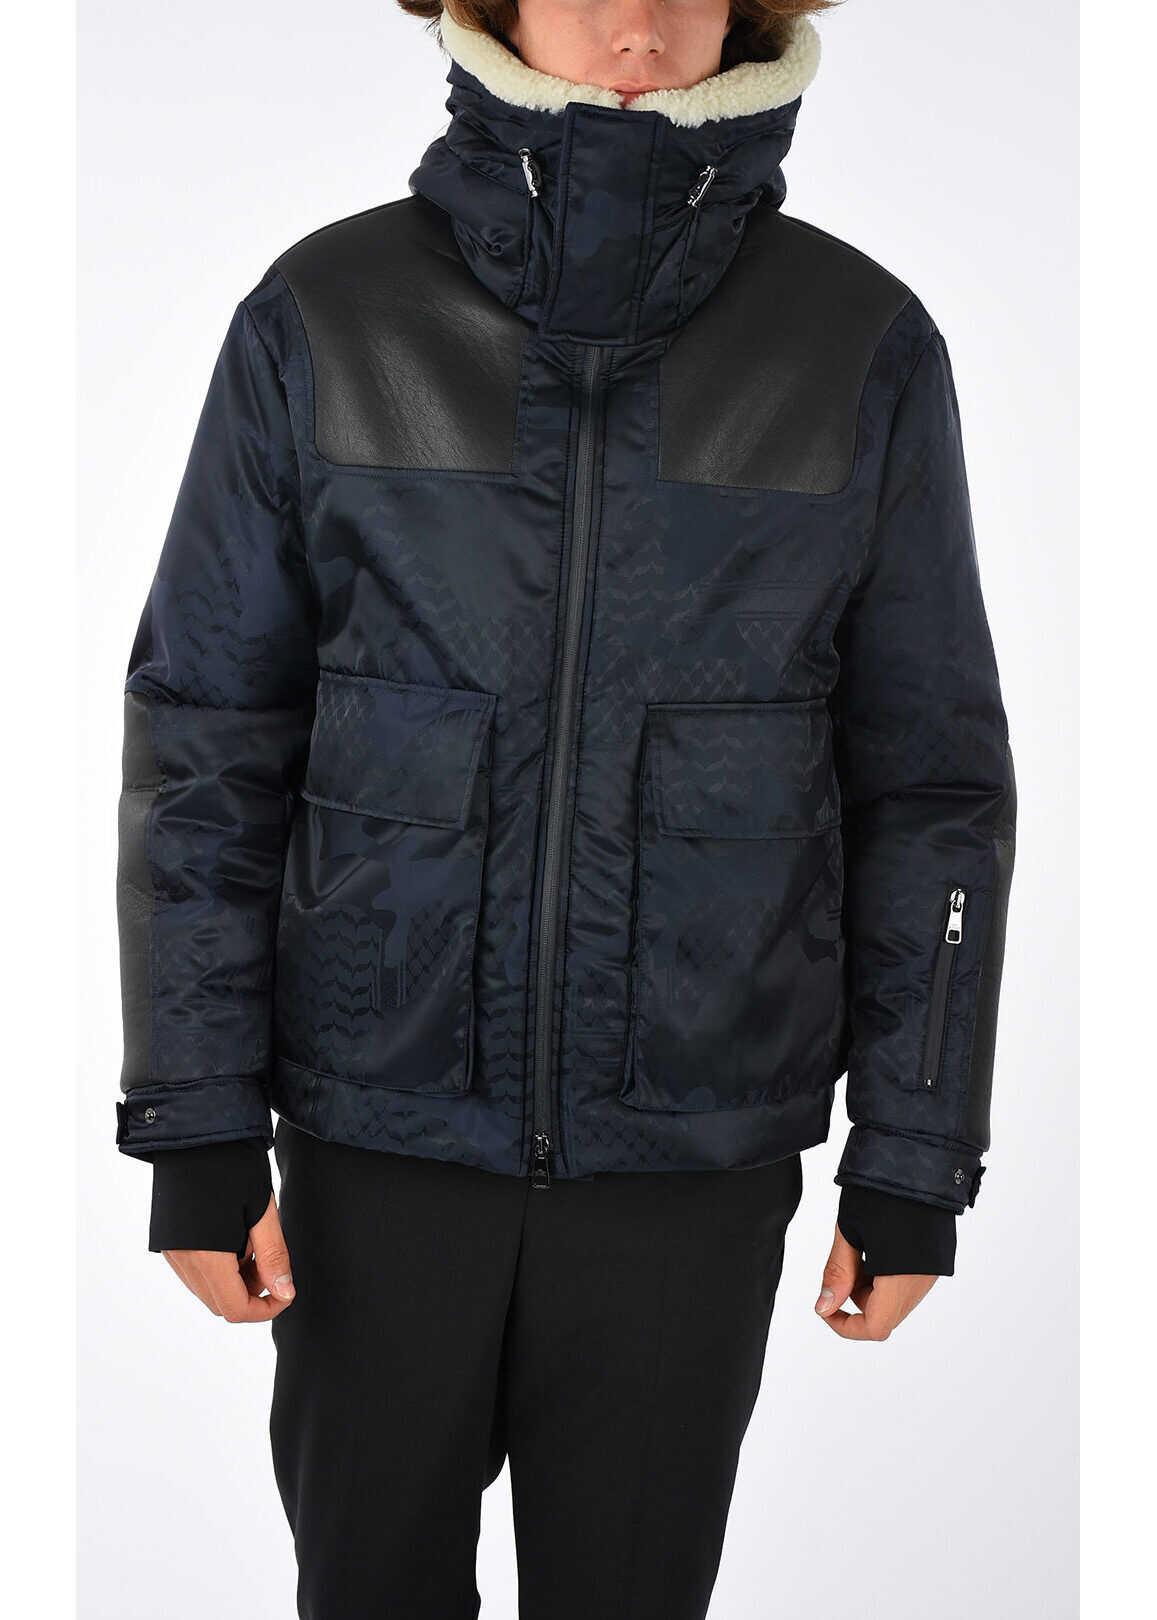 Neil Barrett Nylon Camouflage Jacket BLUE